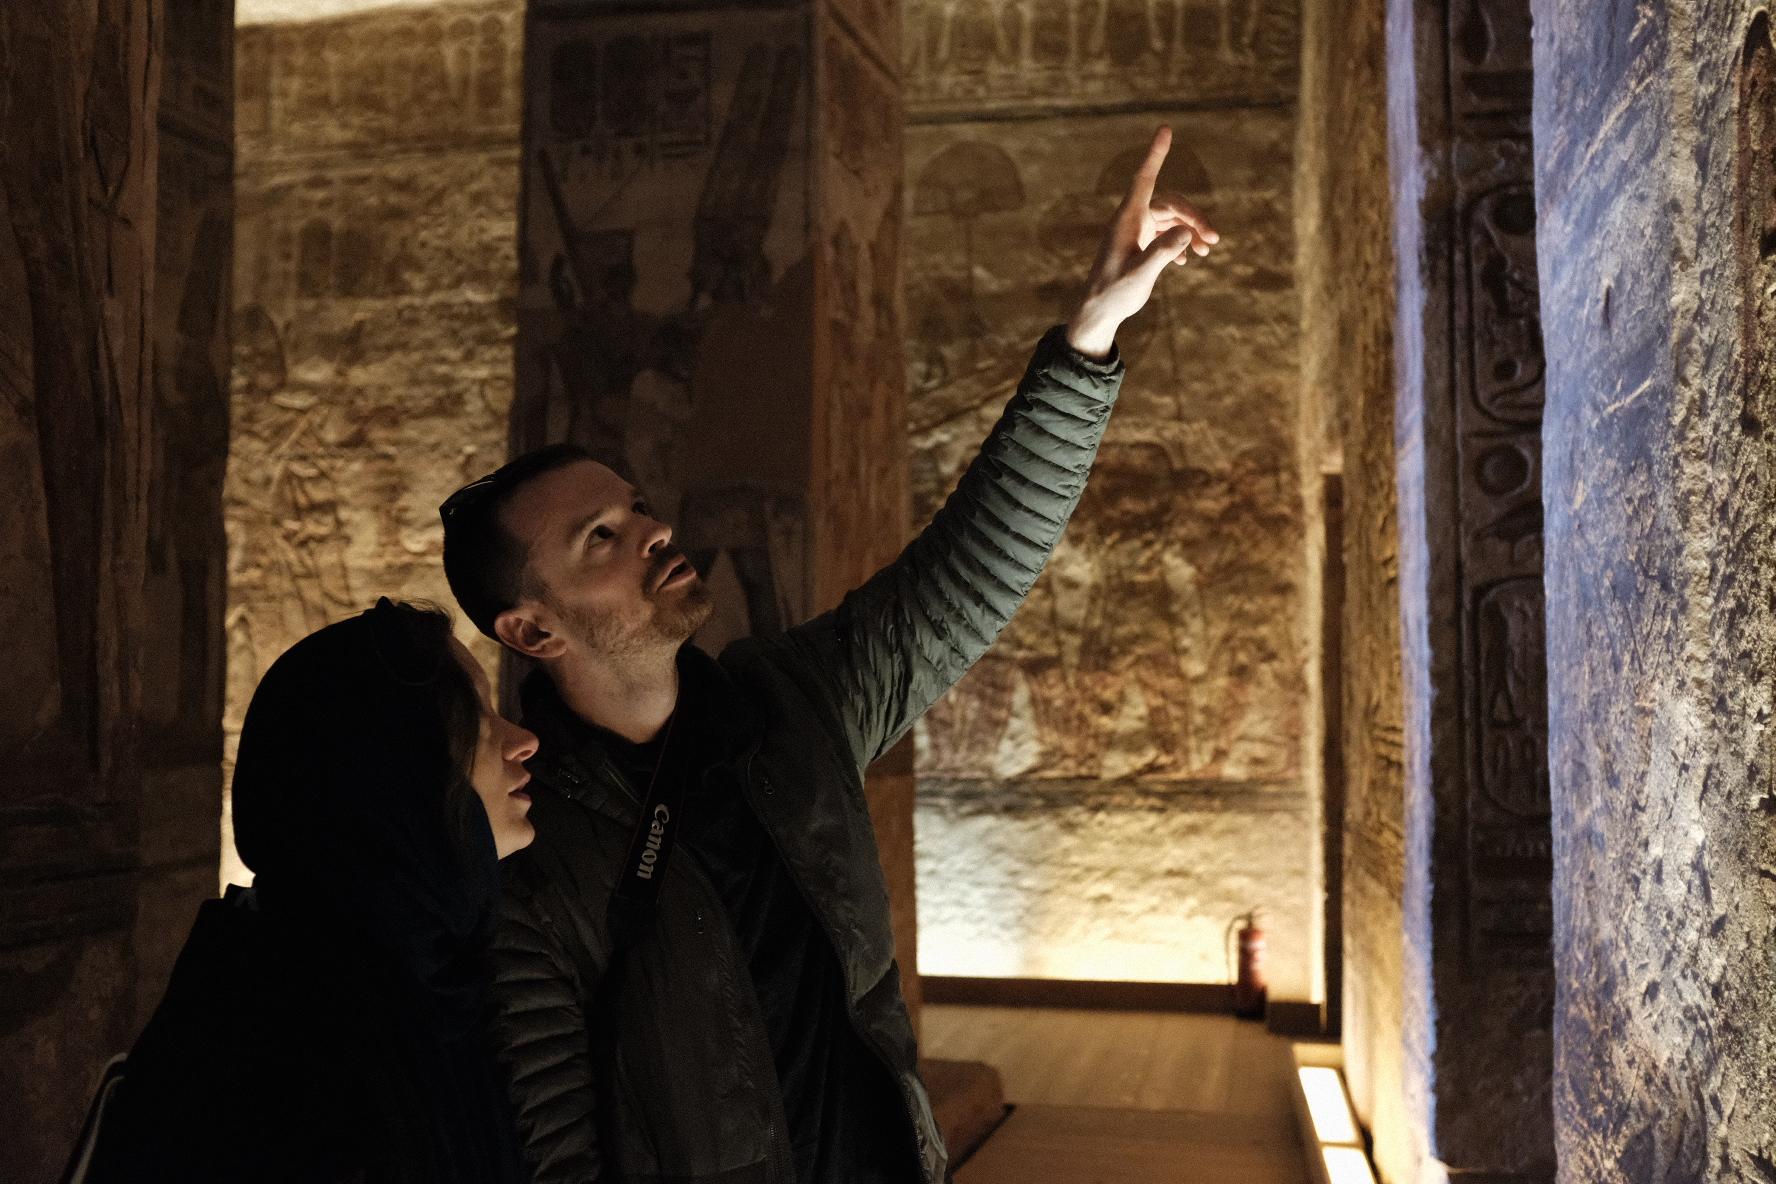 Kara & I exploring Abu Simbel in Egypt